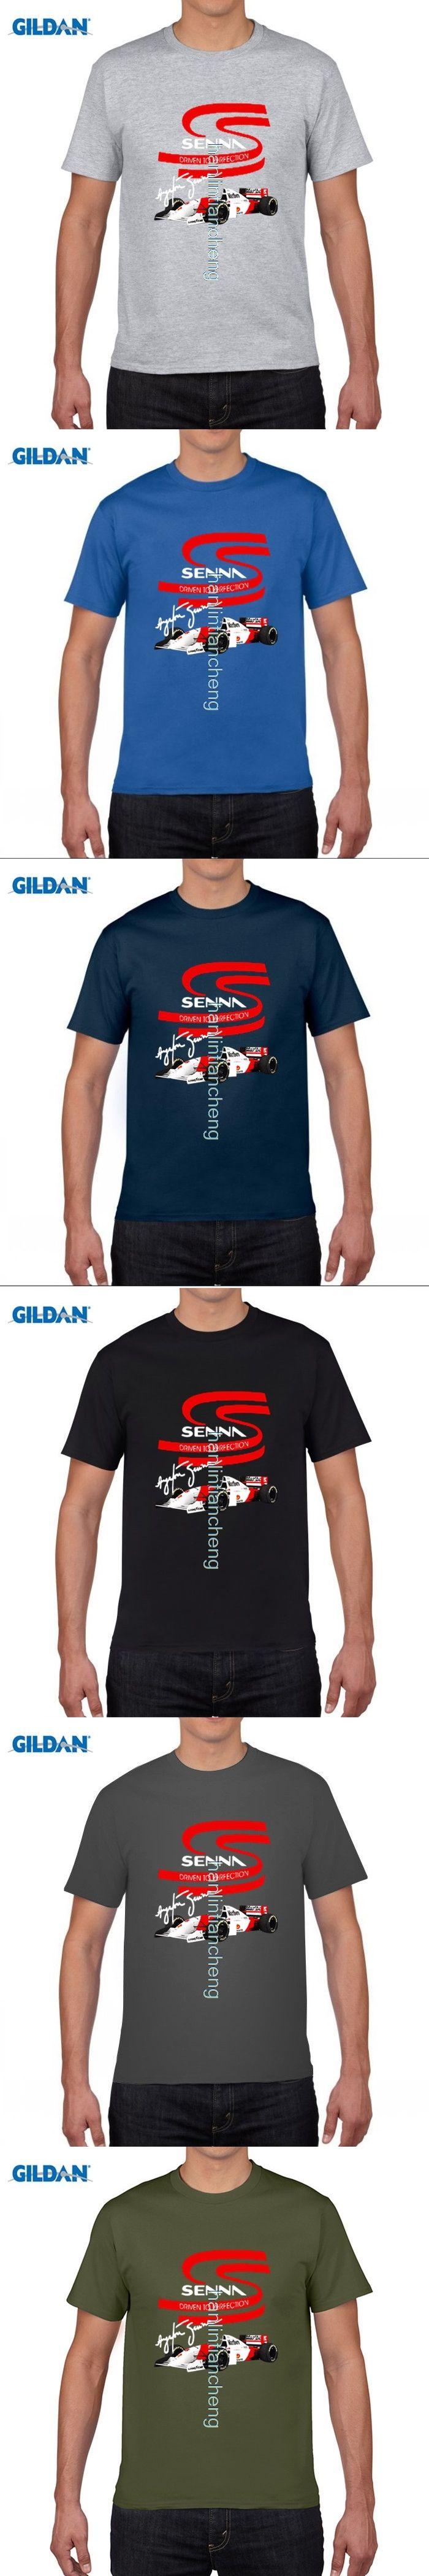 GILDAN DIY style mens t shirts Summer Style Fitness Brand AYRTON SENNA World Legend Logo T-shirt transfers T shirt